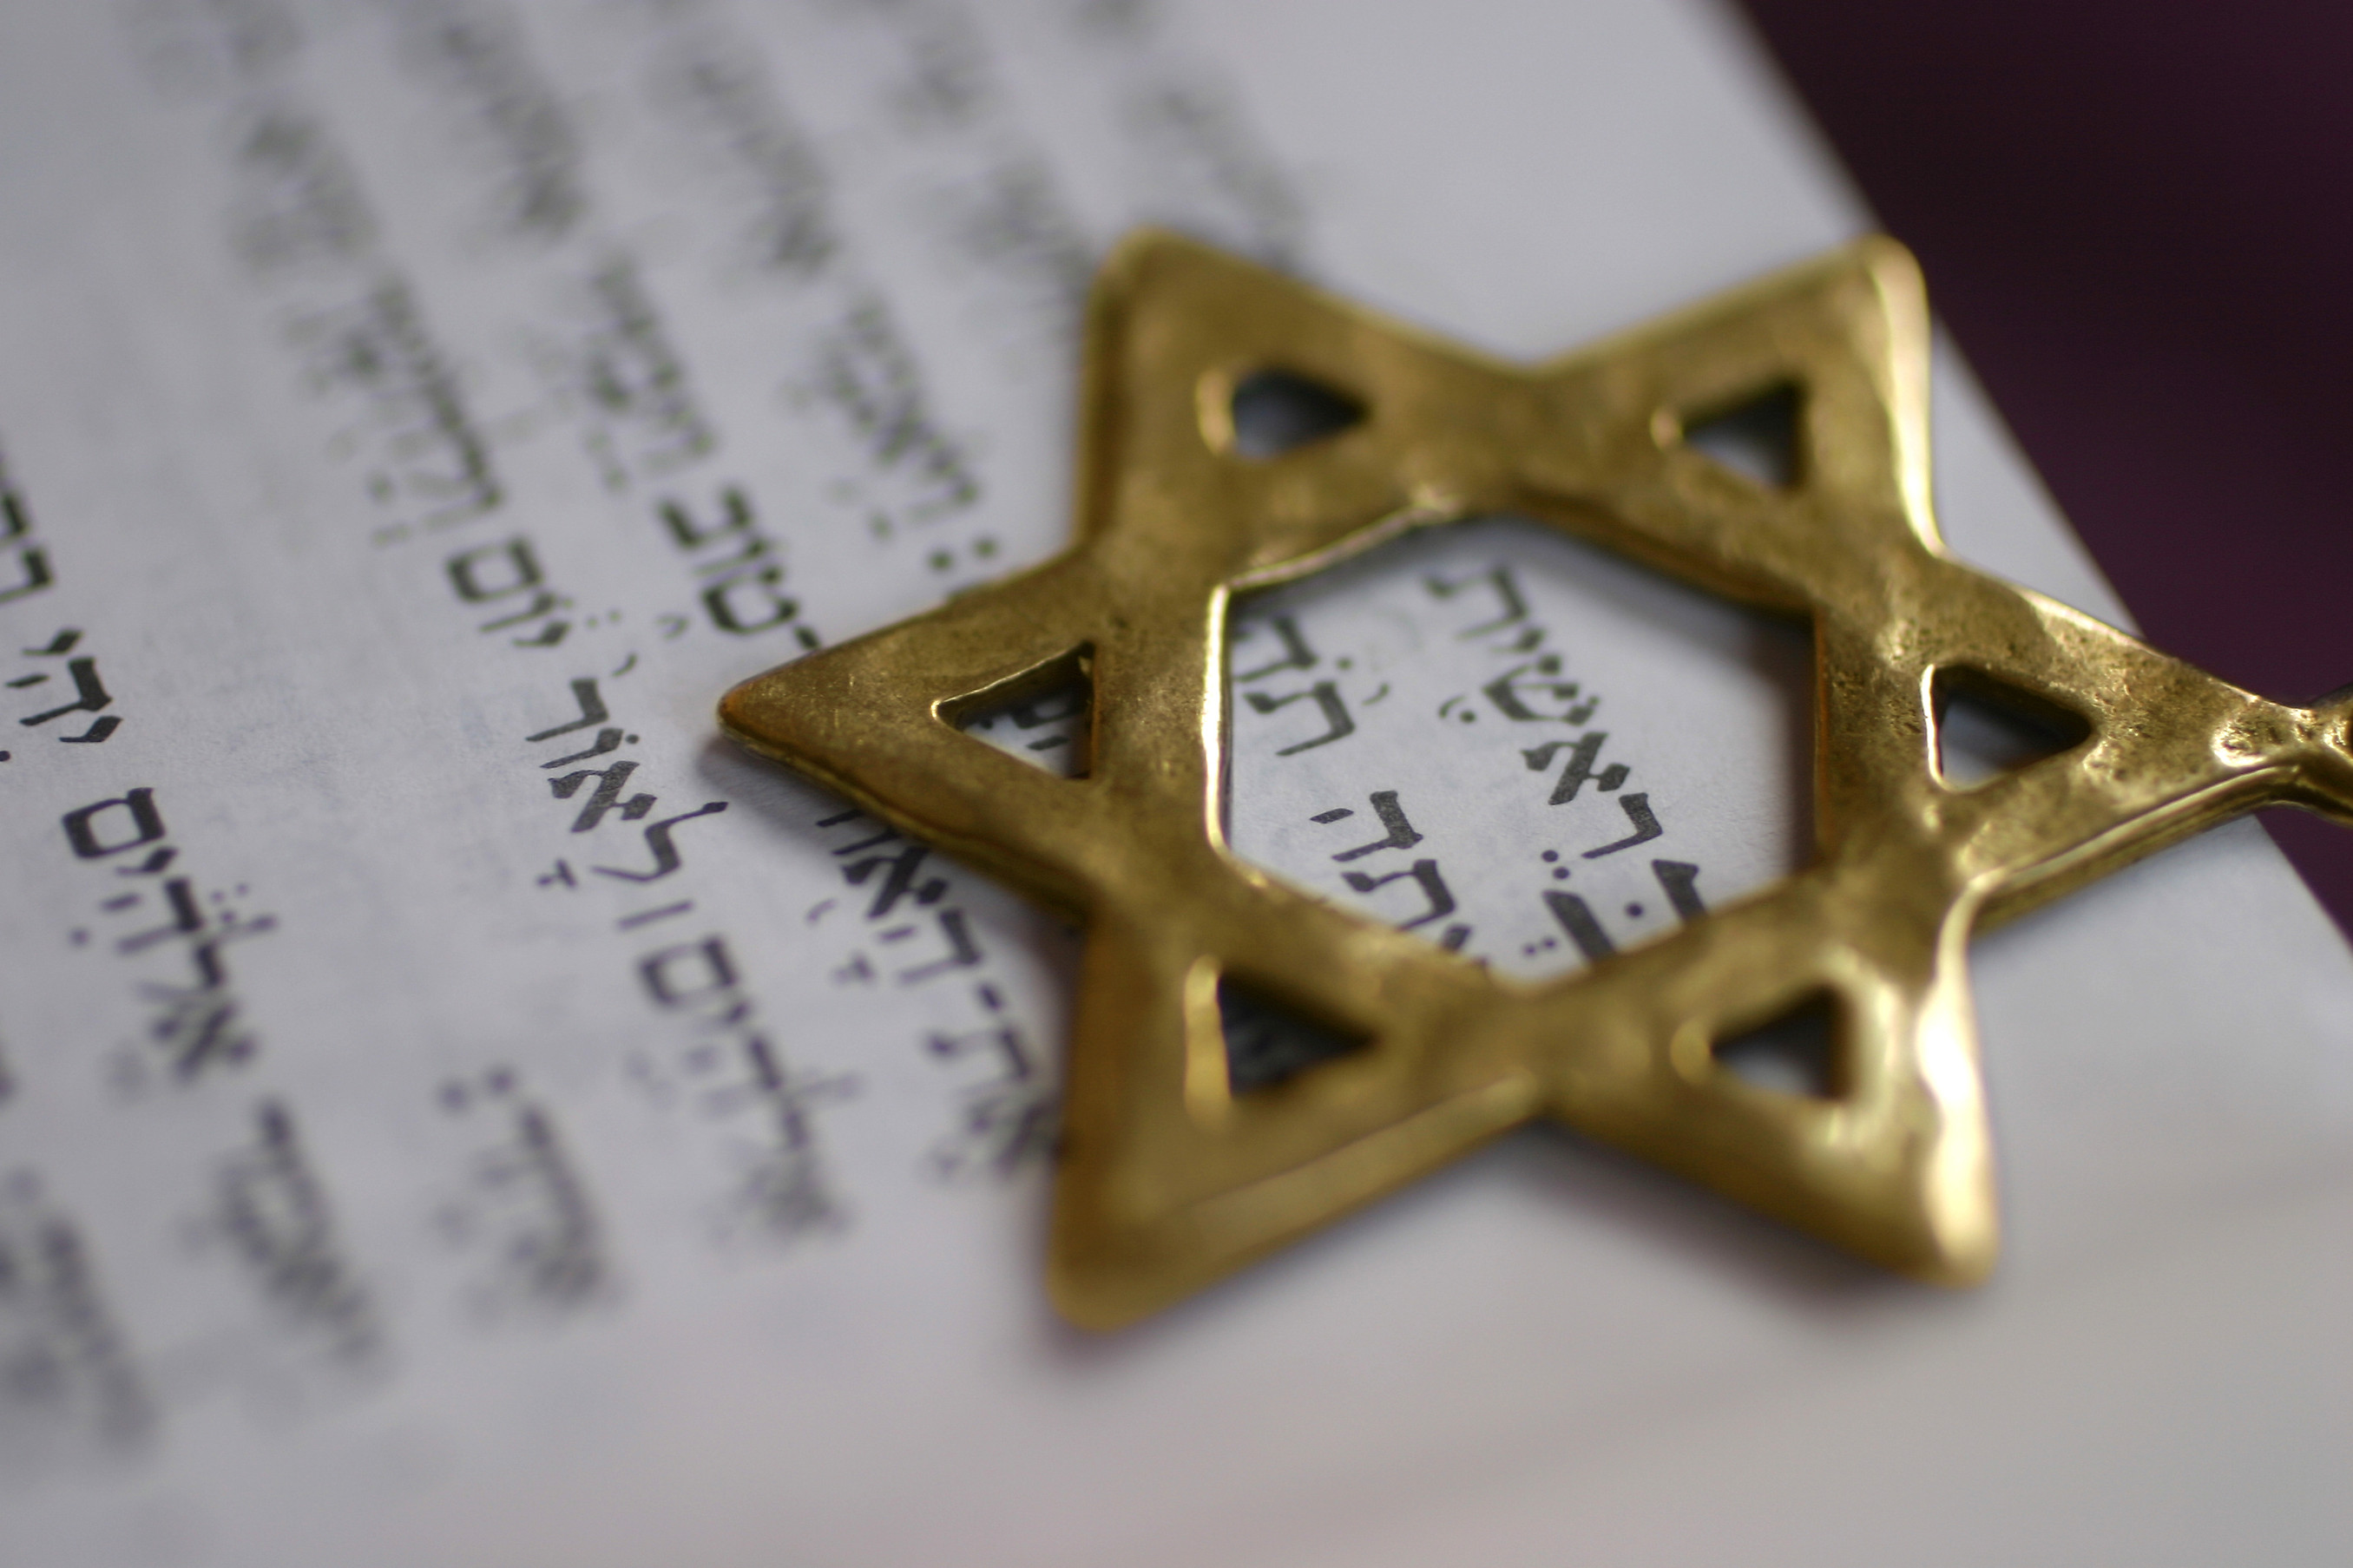 Judaism HD Wallpaper | Background Image | 2711x1807 | ID:202646 ...